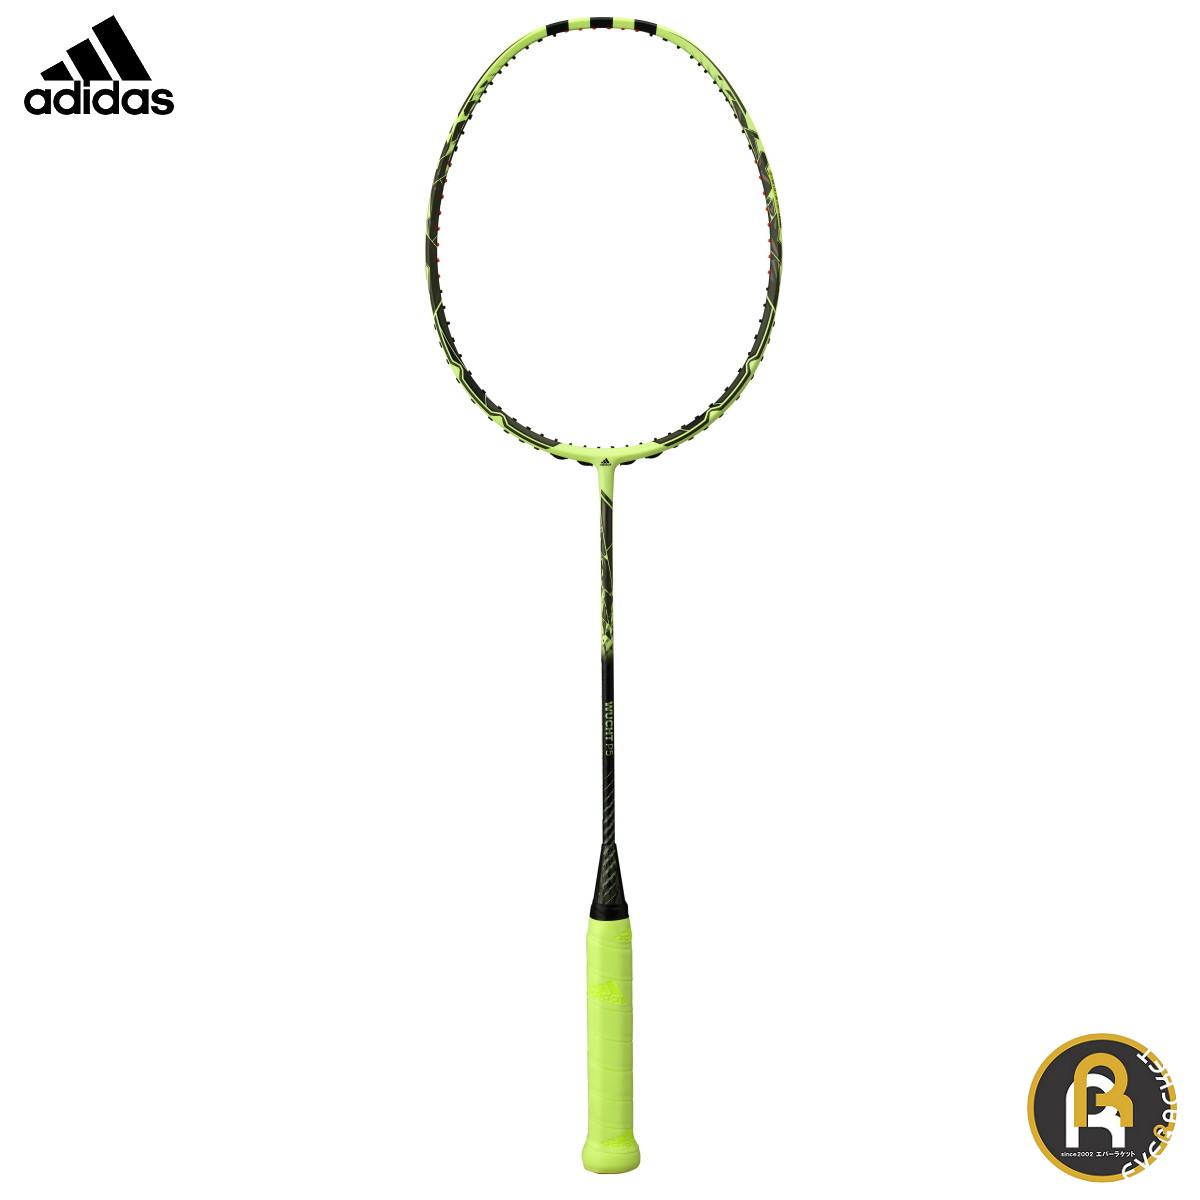 adidas アディダス バドミントン バドミントンラケット ヴフトP5 ラケット RK908501《ガット代・張り代無料》